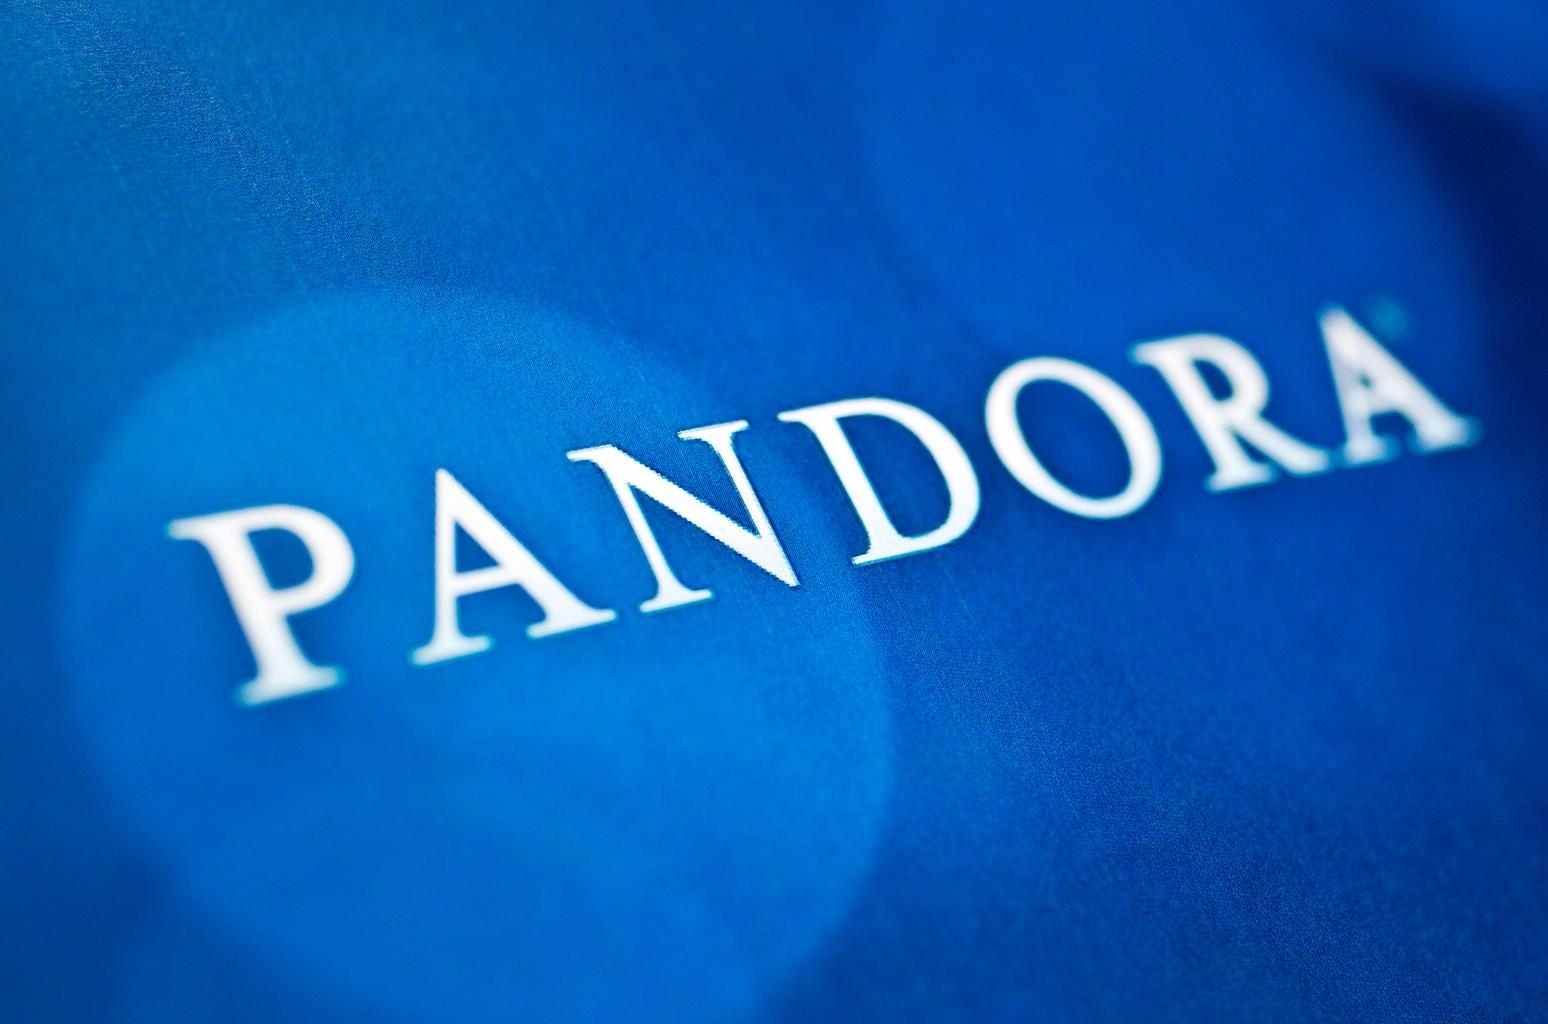 The Pandora Media Inc.